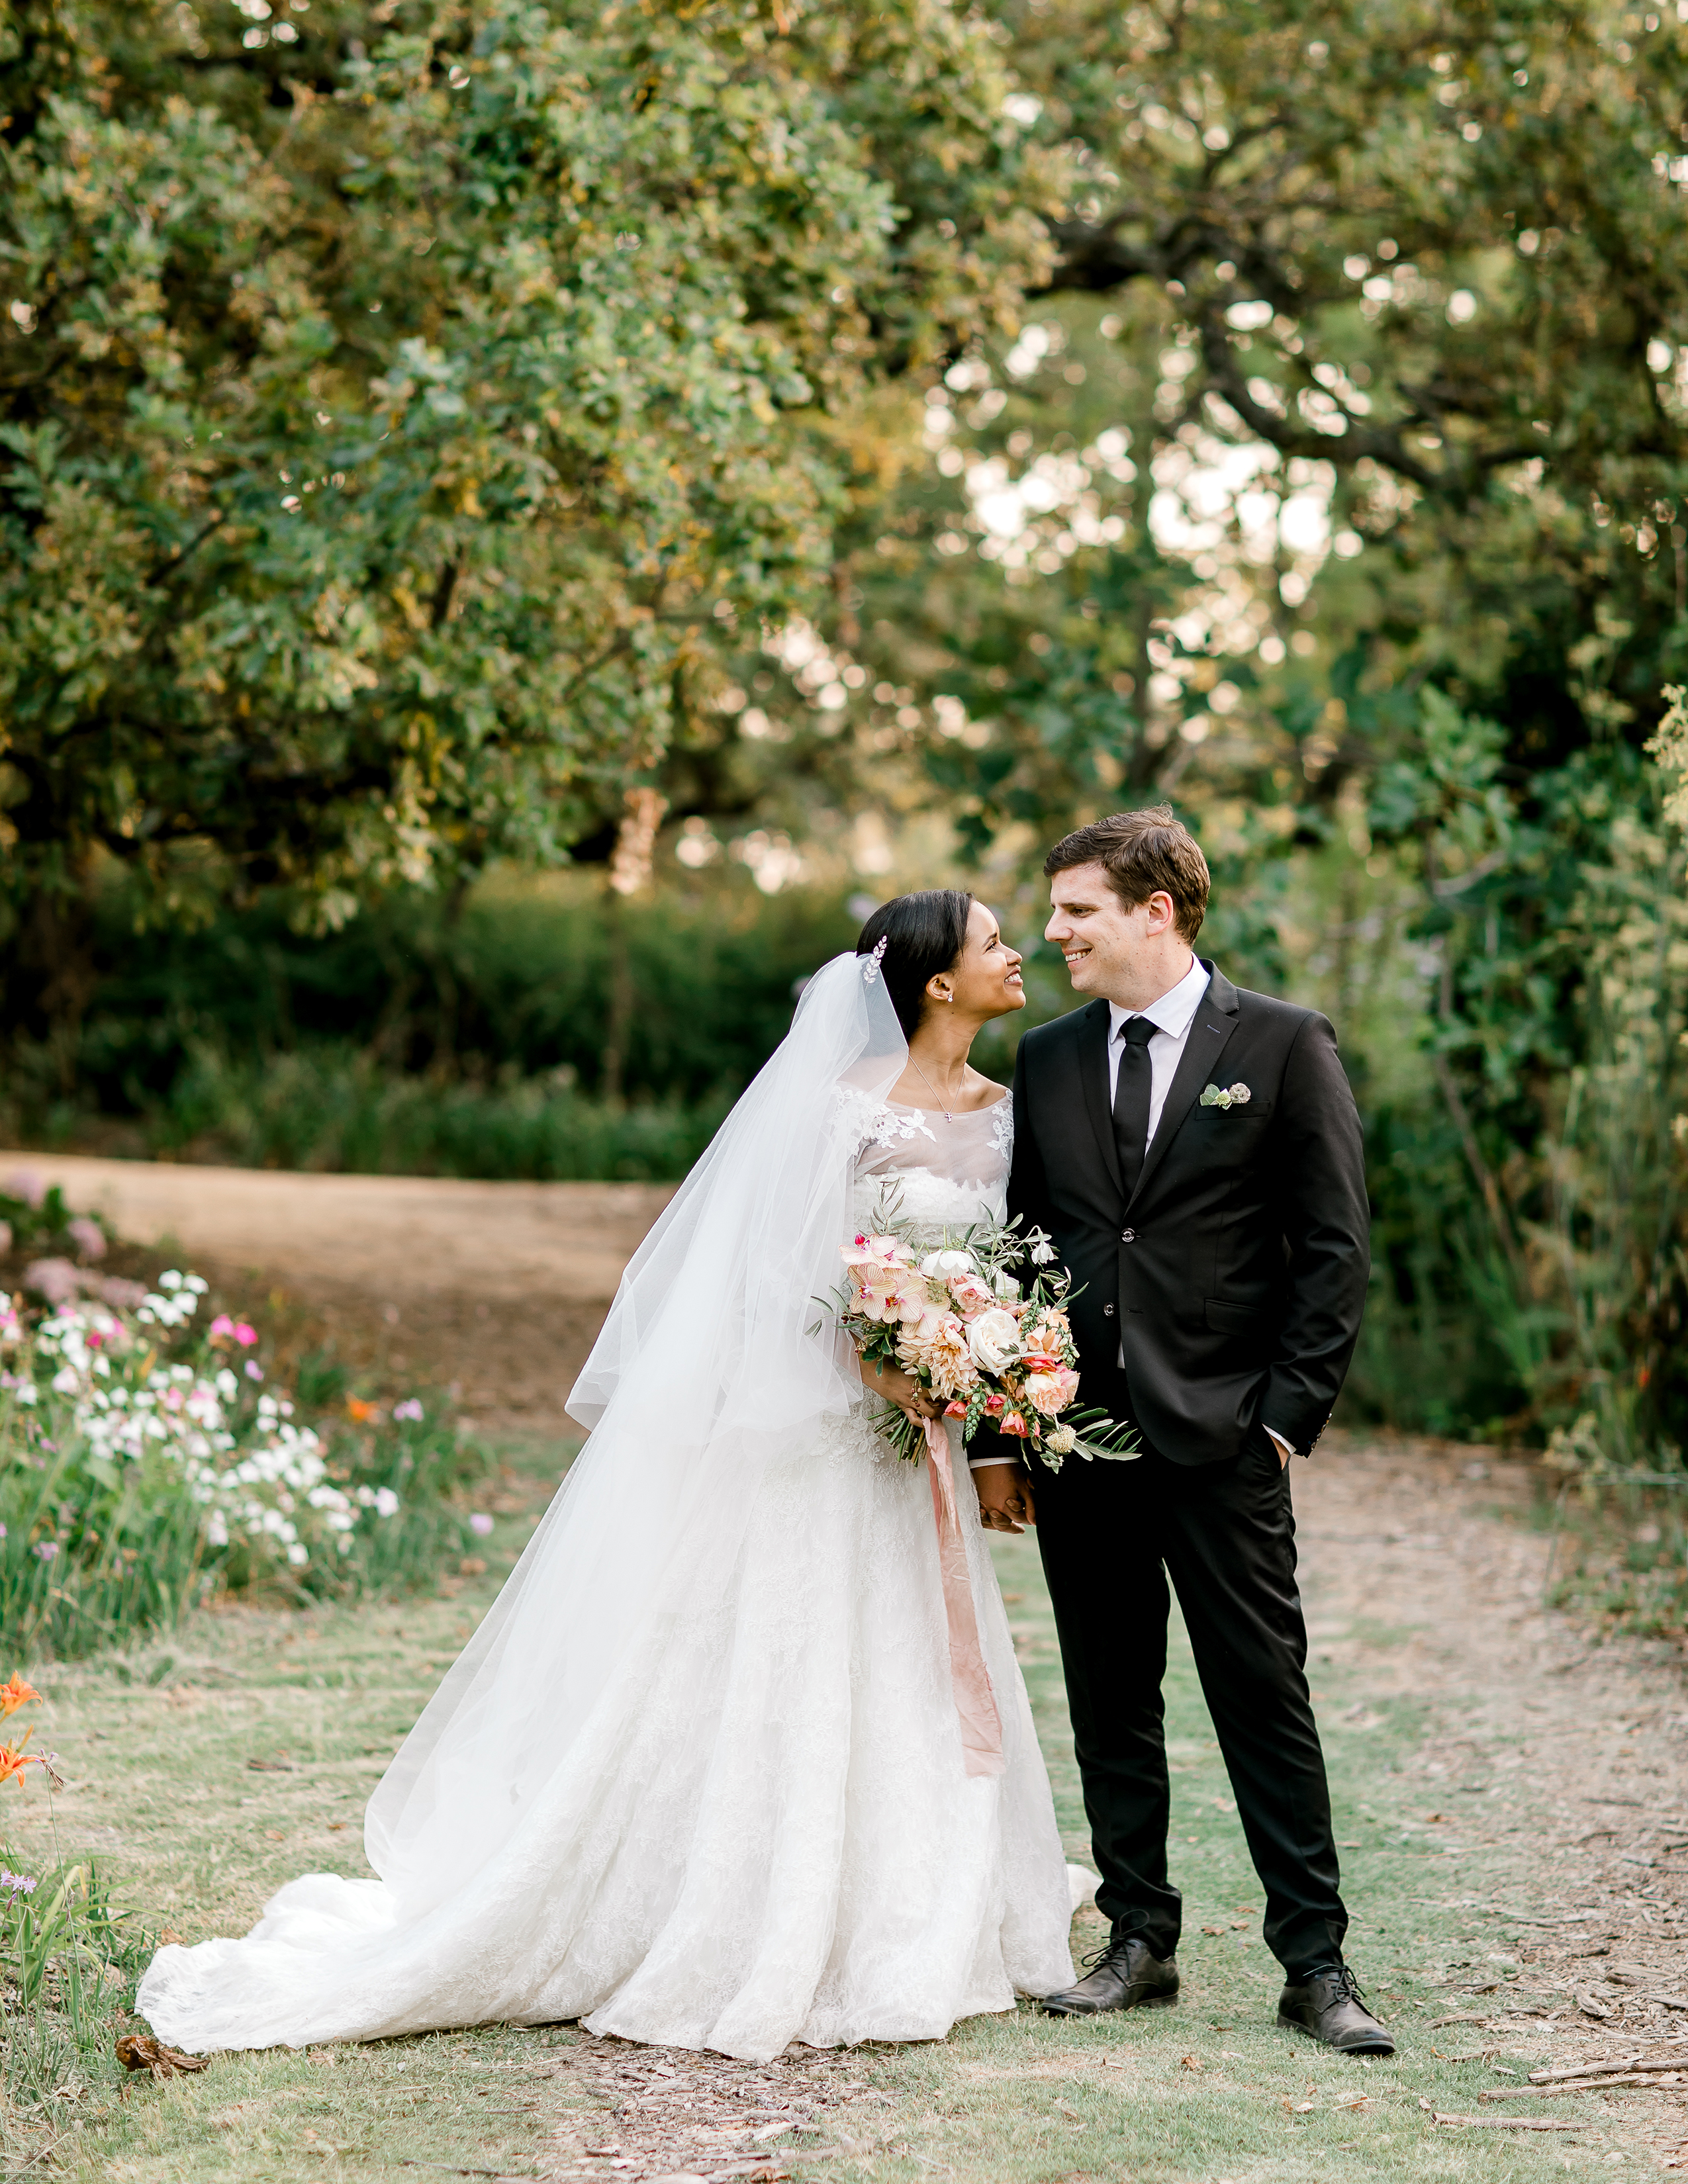 rorisang stephen wedding couple